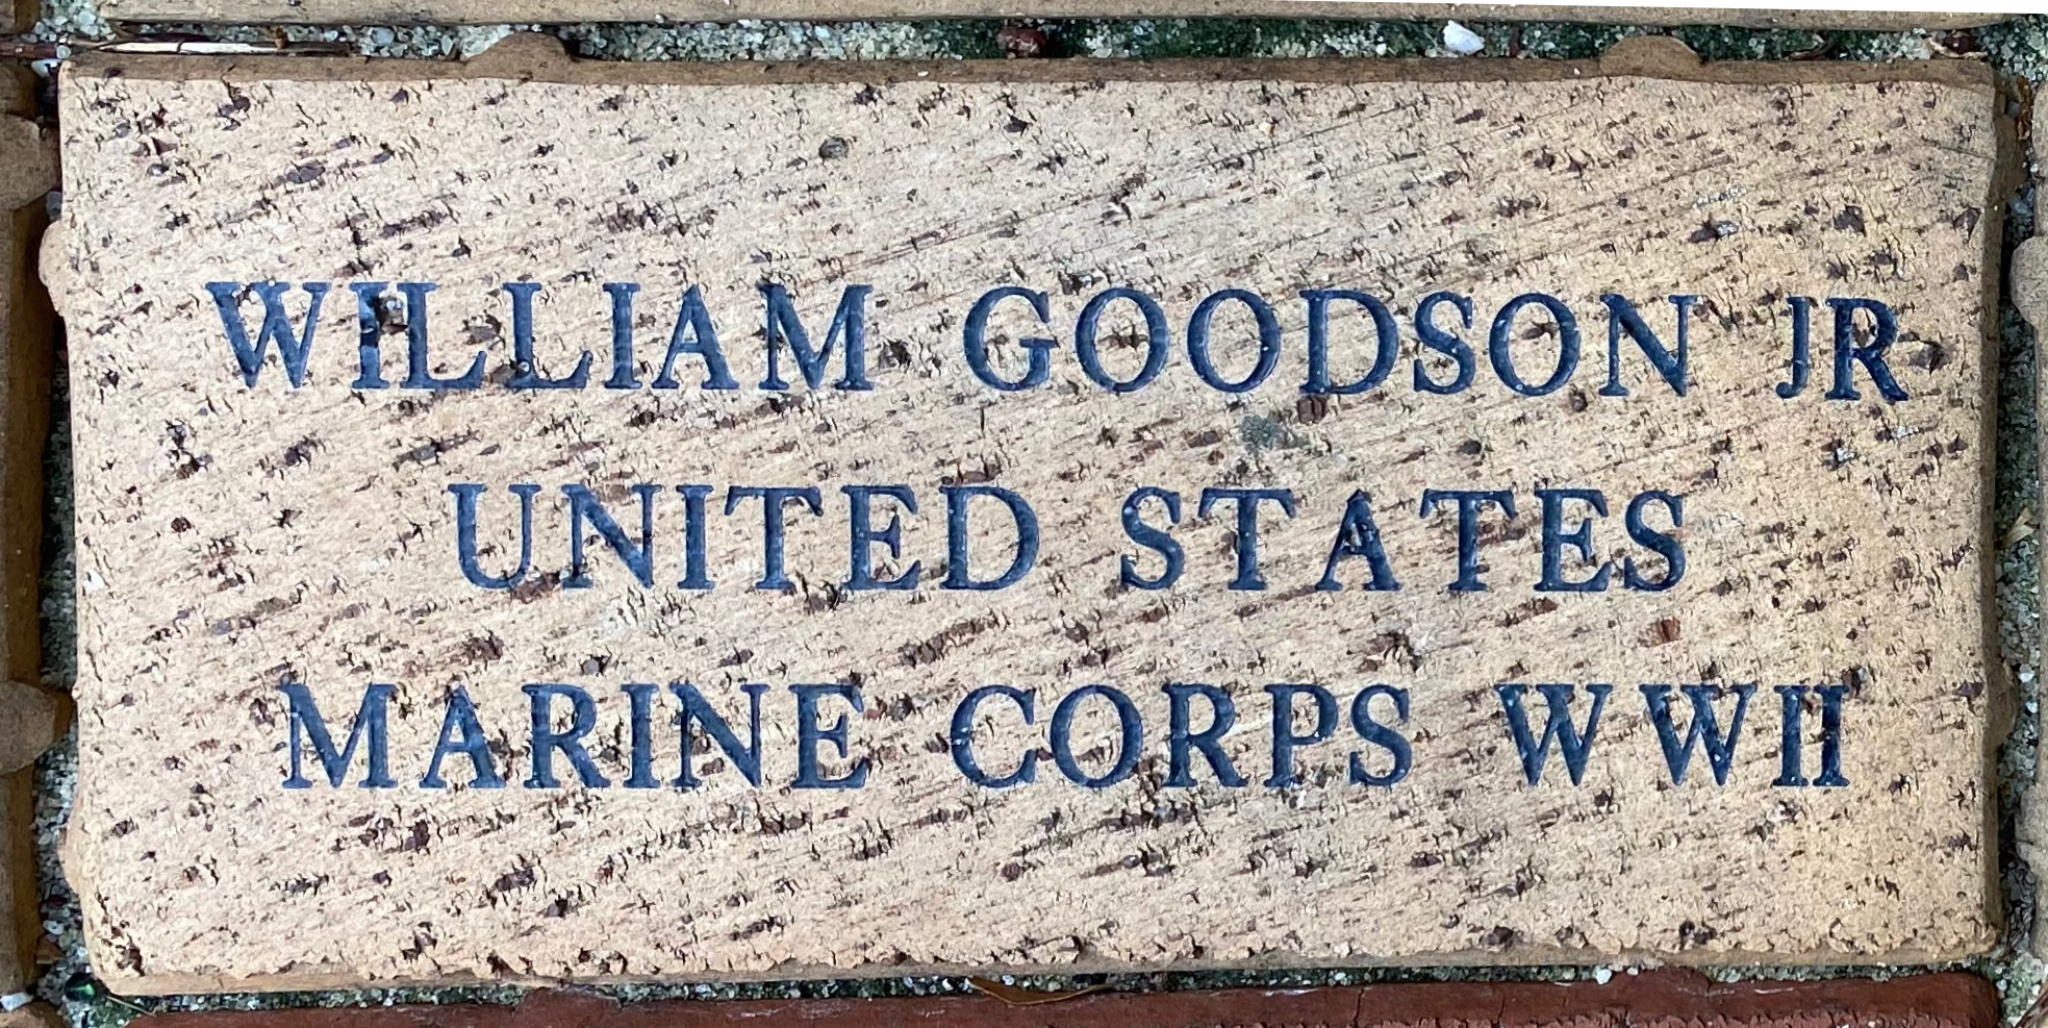 WILLIAM GOODSON JR UNITED STATES MARINE CORPS WWII